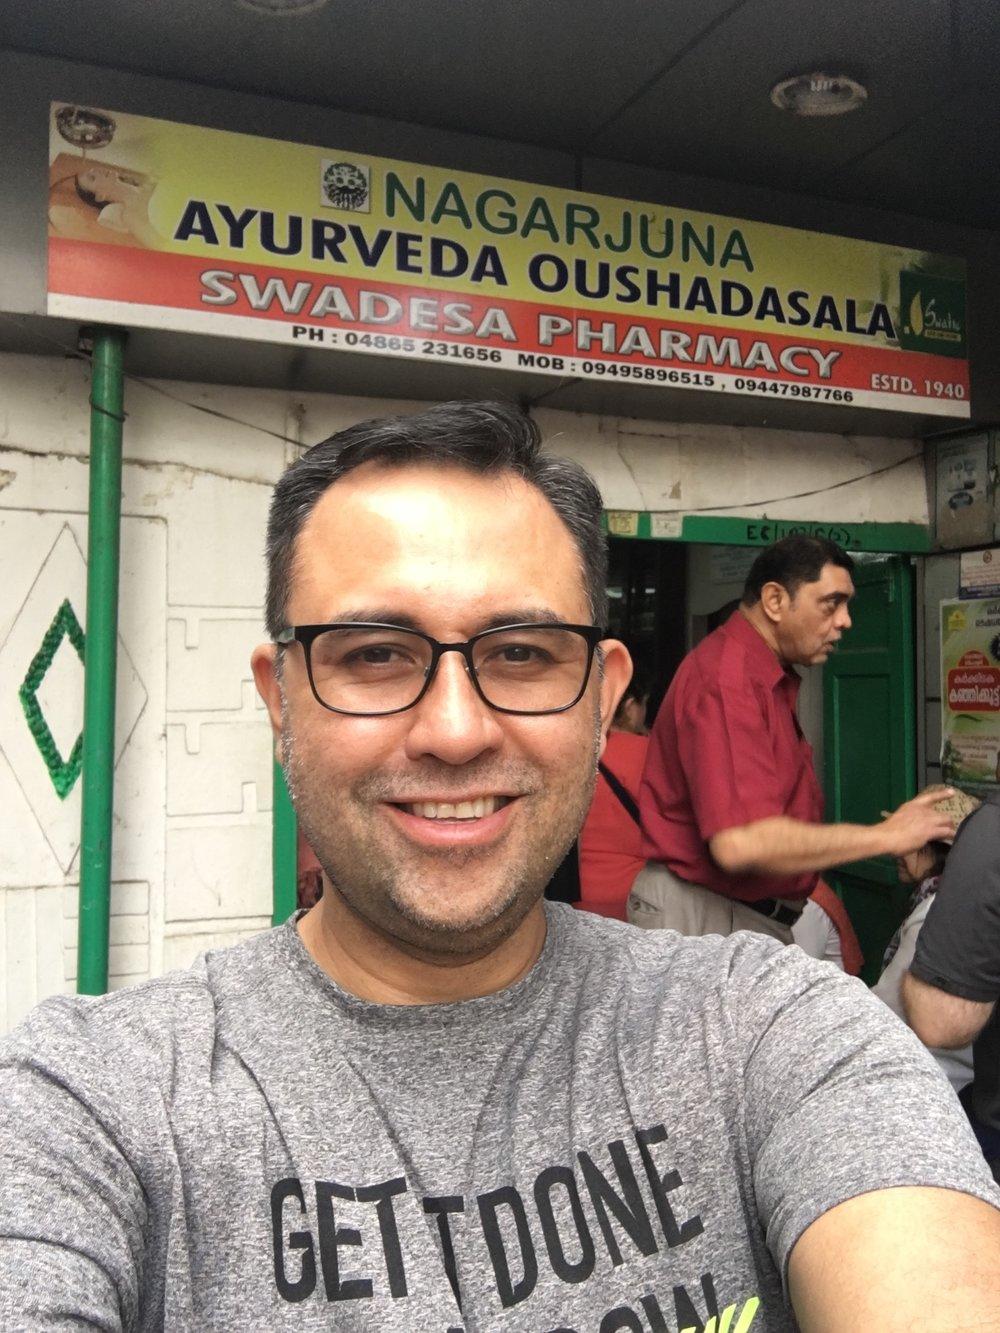 Visiting an Ayurvedic Pharmacy